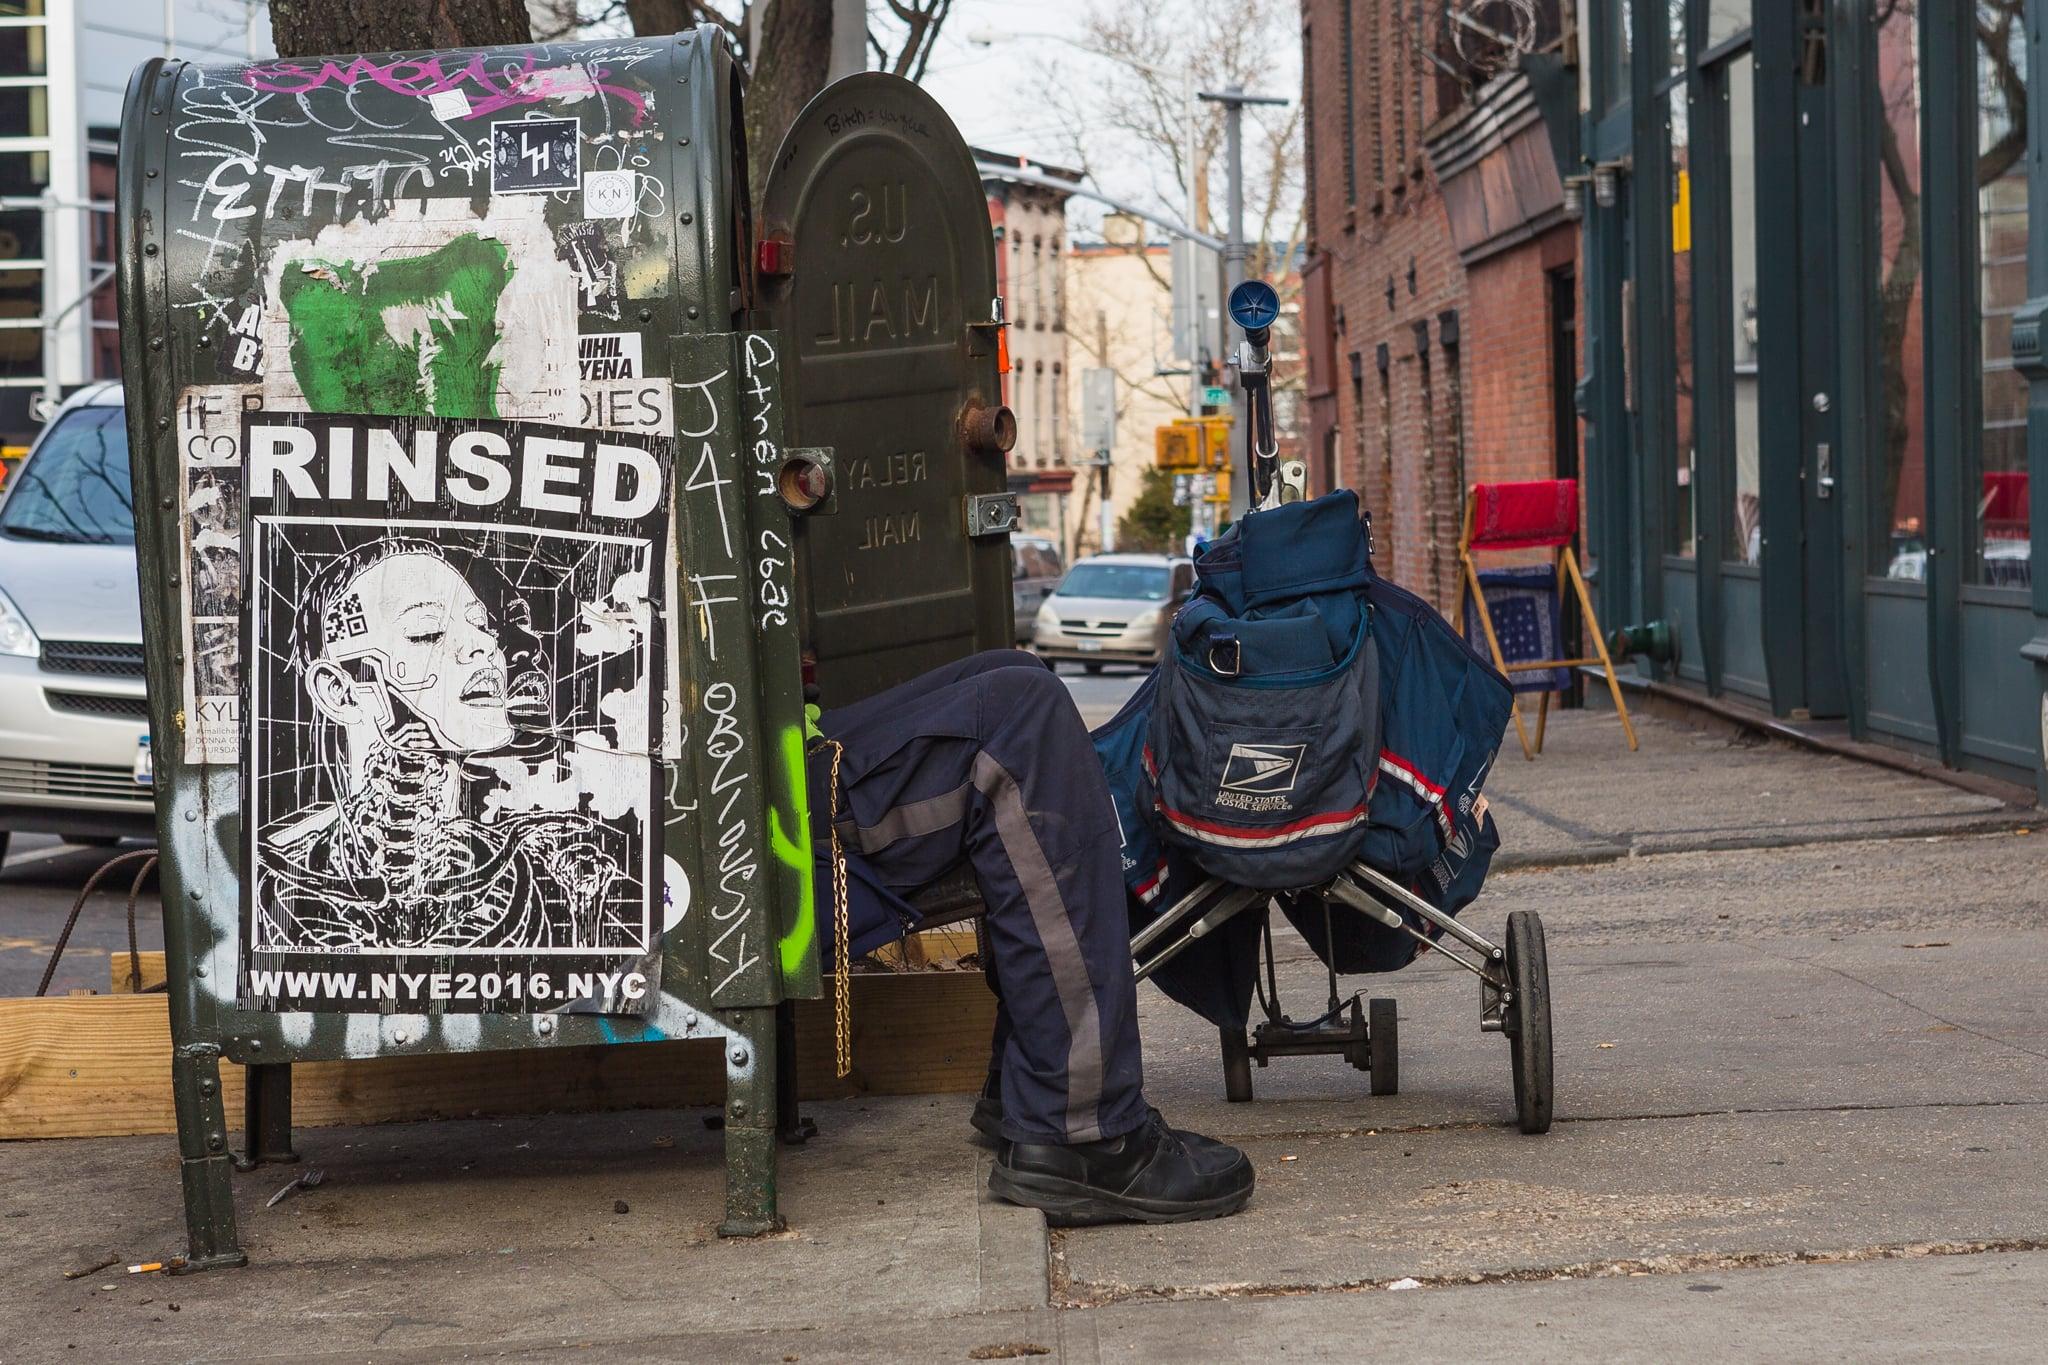 Brooklyn, New York, January, 2016